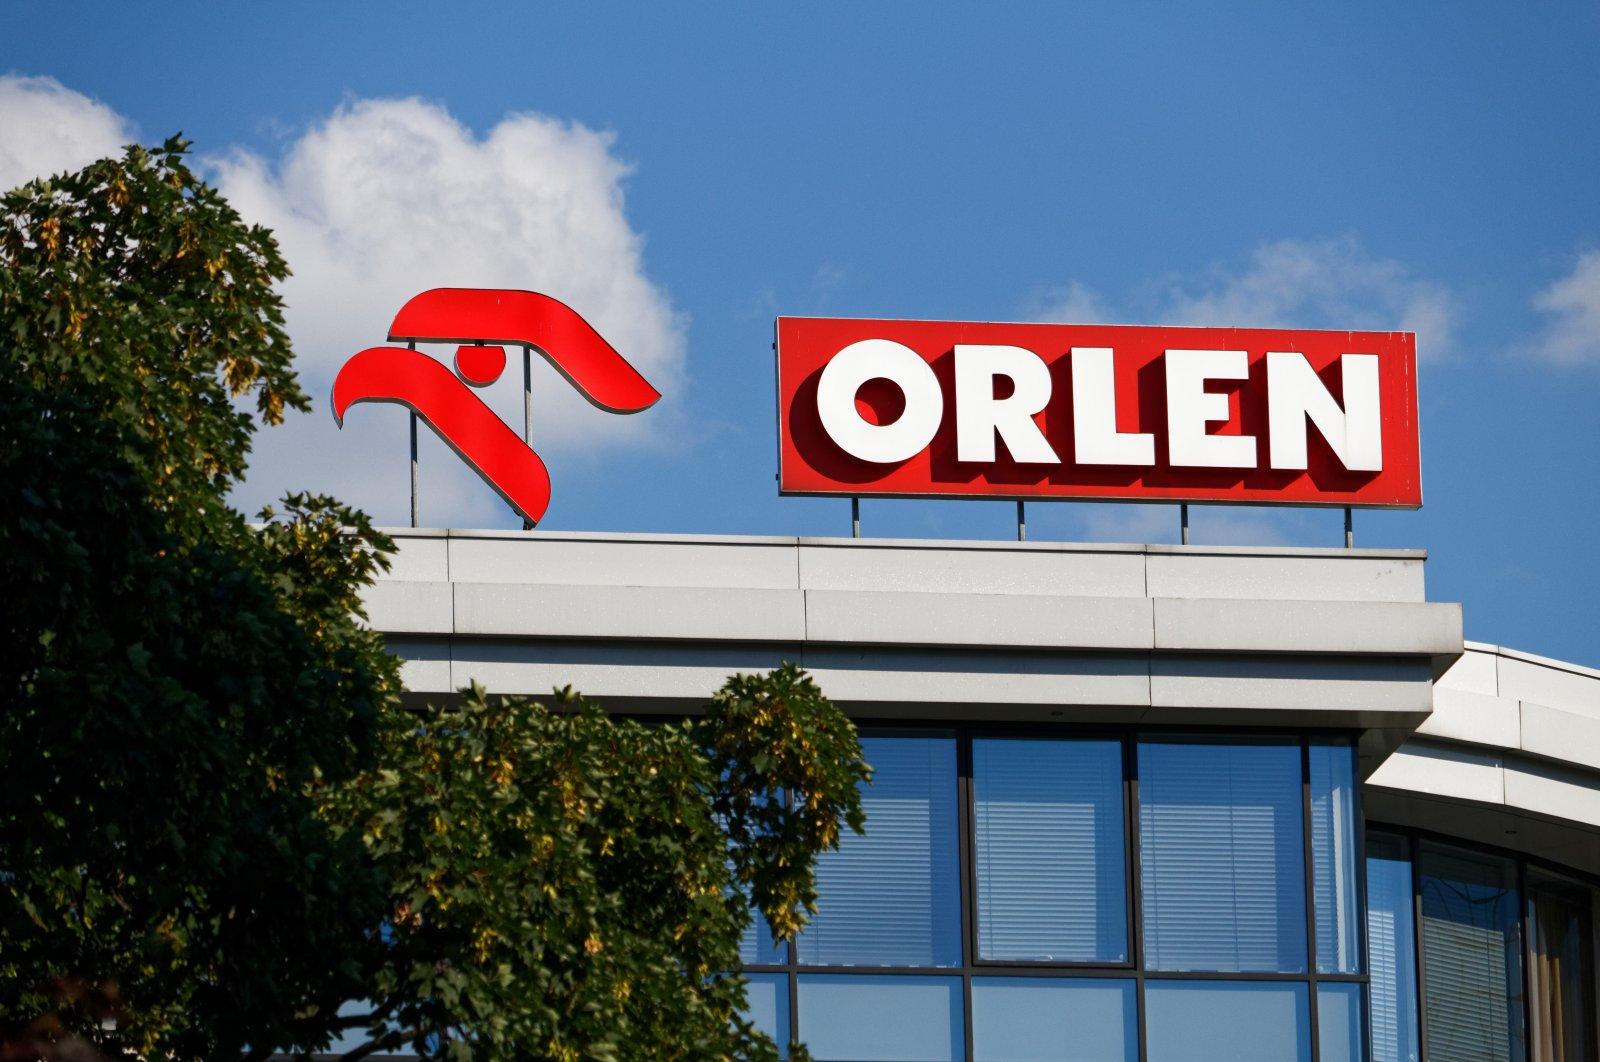 Logo of the PKN Orlen on the top of a building, Warsaw, Poland, July 4, 2018. (Shutterstock Photo by Mateusz Szymanski)